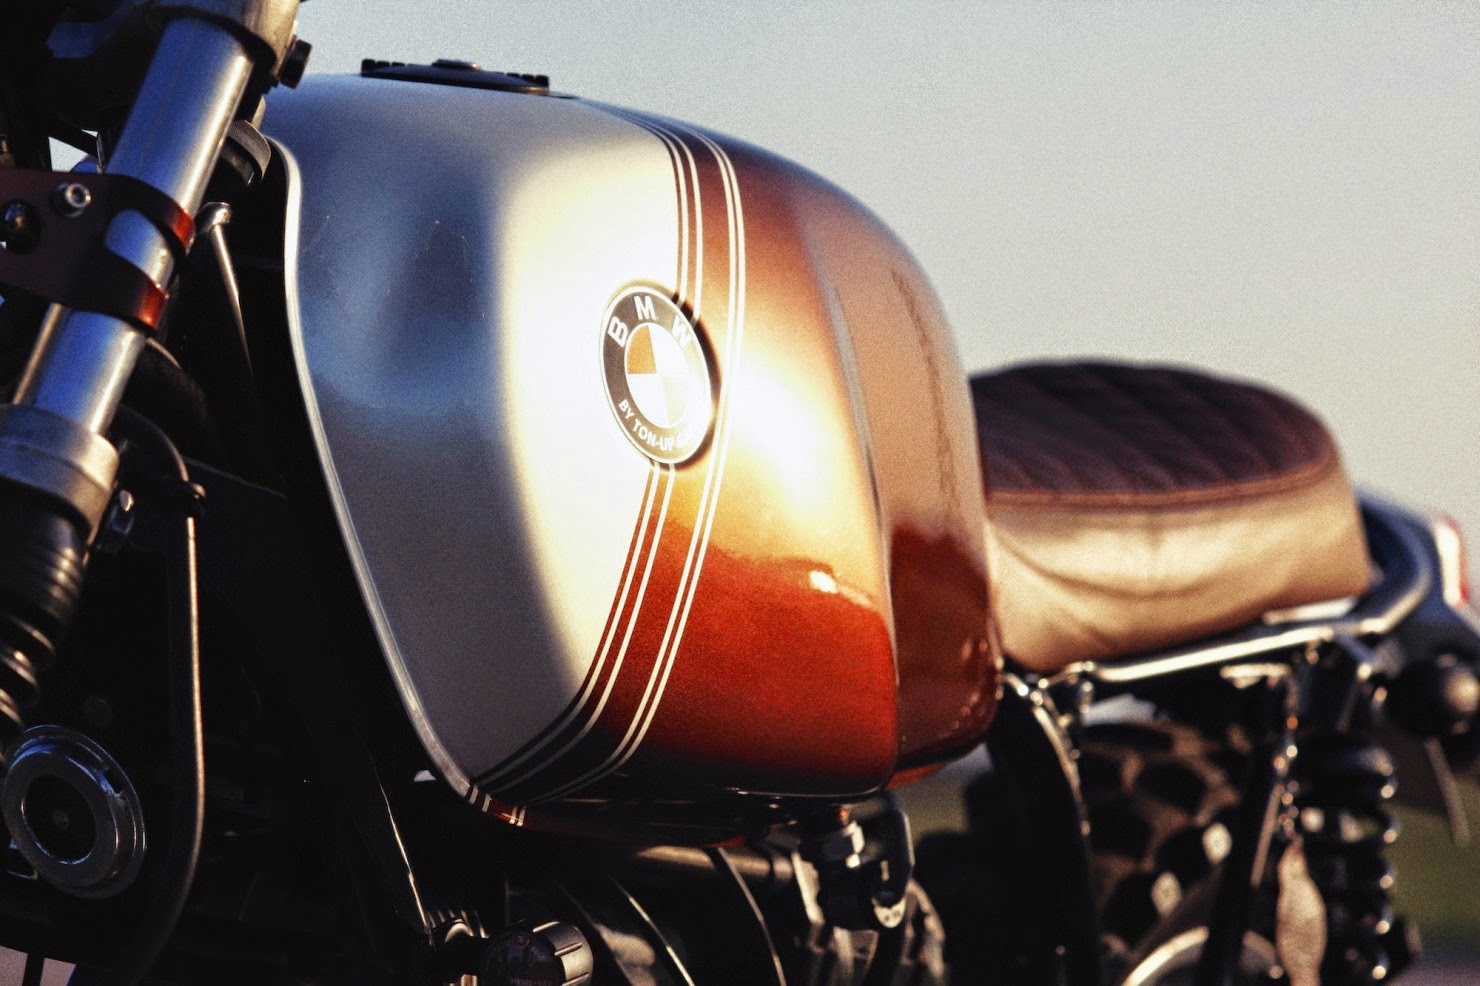 BMW-R45-Custom-Motorcycle-16-1480x986